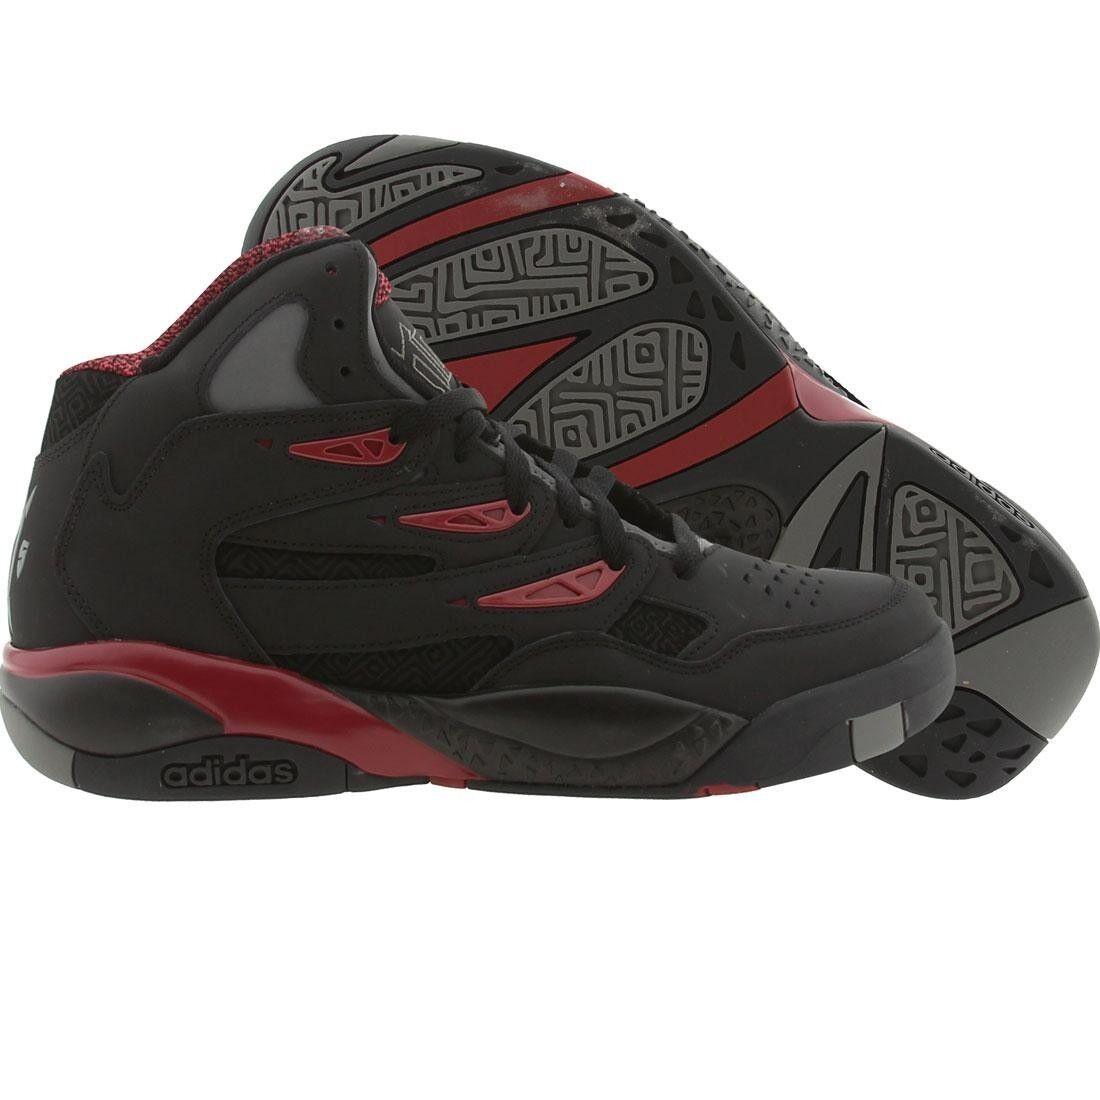 Adidas Adidas Adidas mutombo 2 c75206 nero & bordeaux basket uomini sz 7,5   12 | Conveniente  bbbfa0